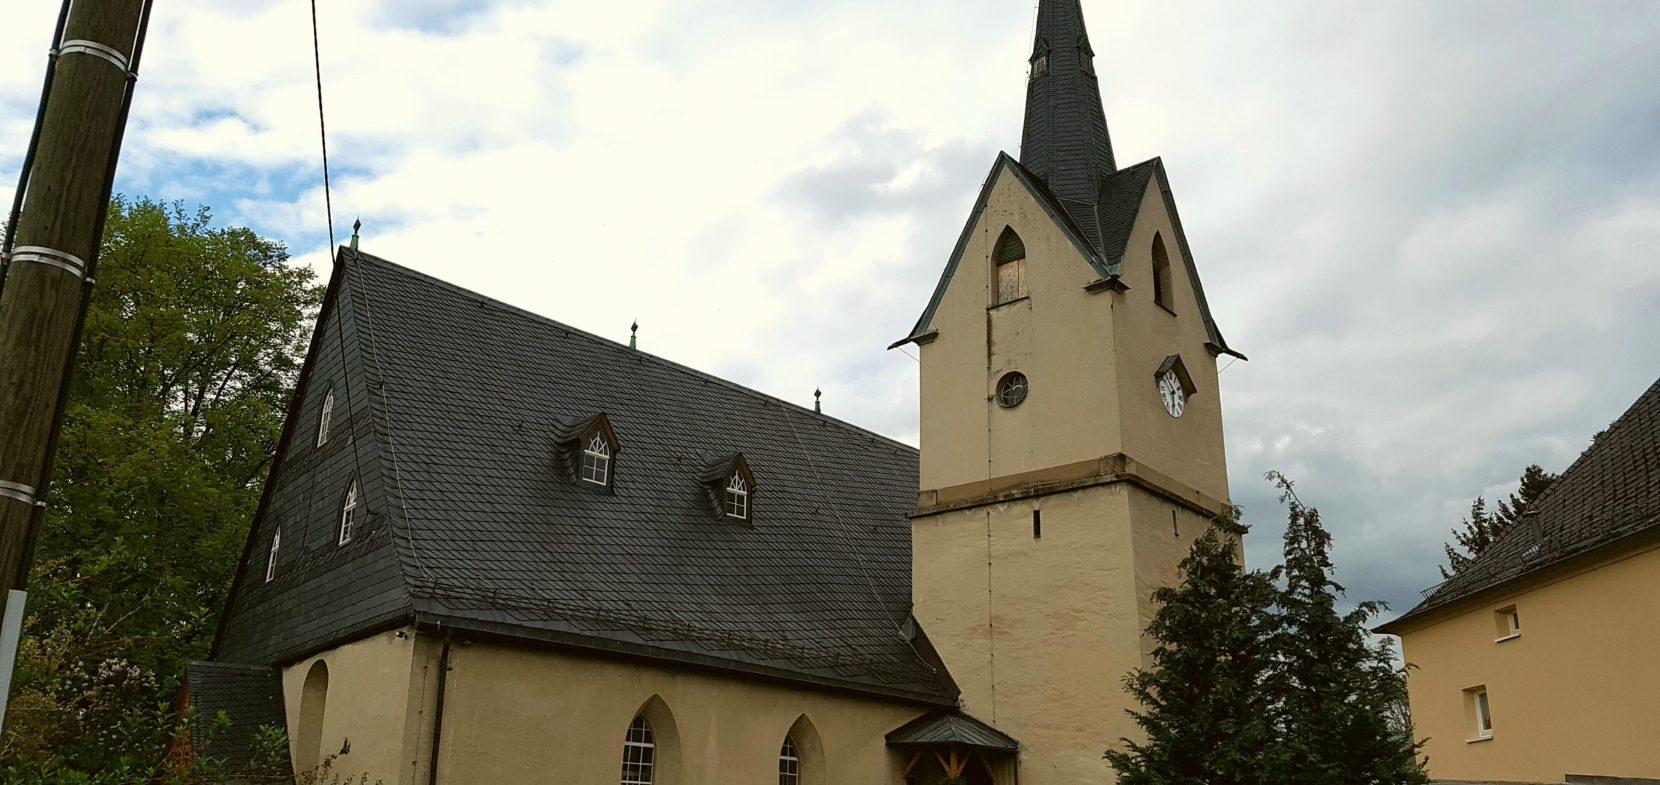 Ev.-Luth. Kirchgemeinde Theuma-Altensalz